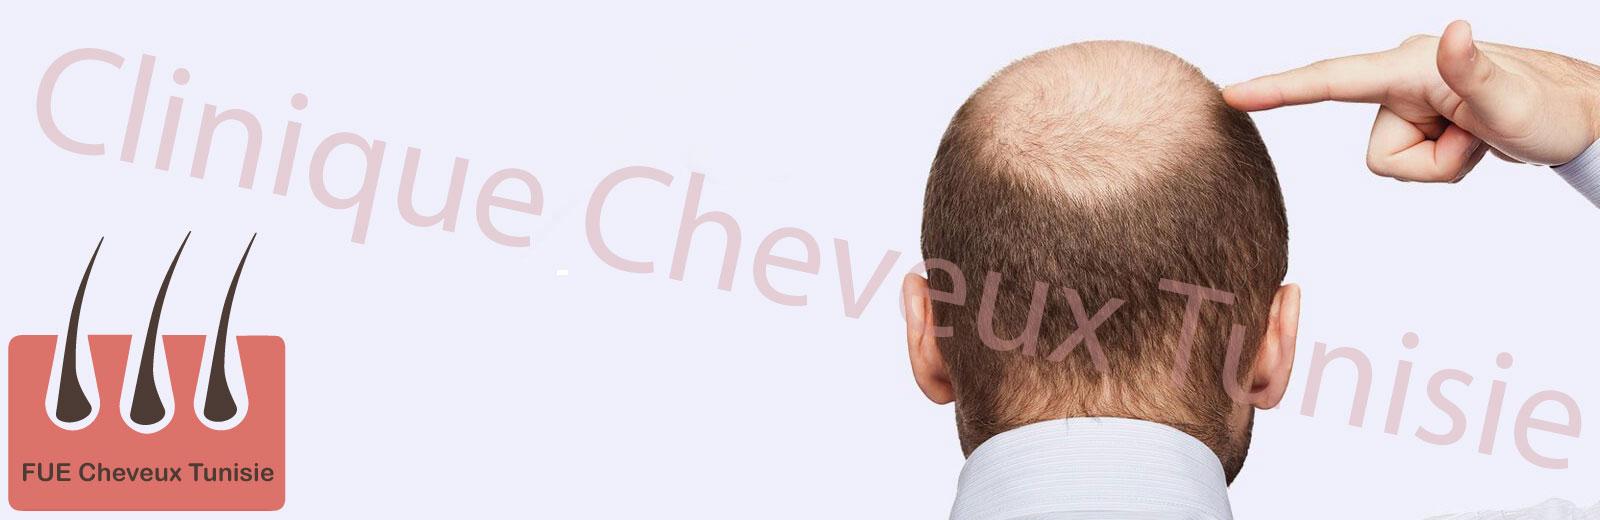 clinique cheveux Tunisie